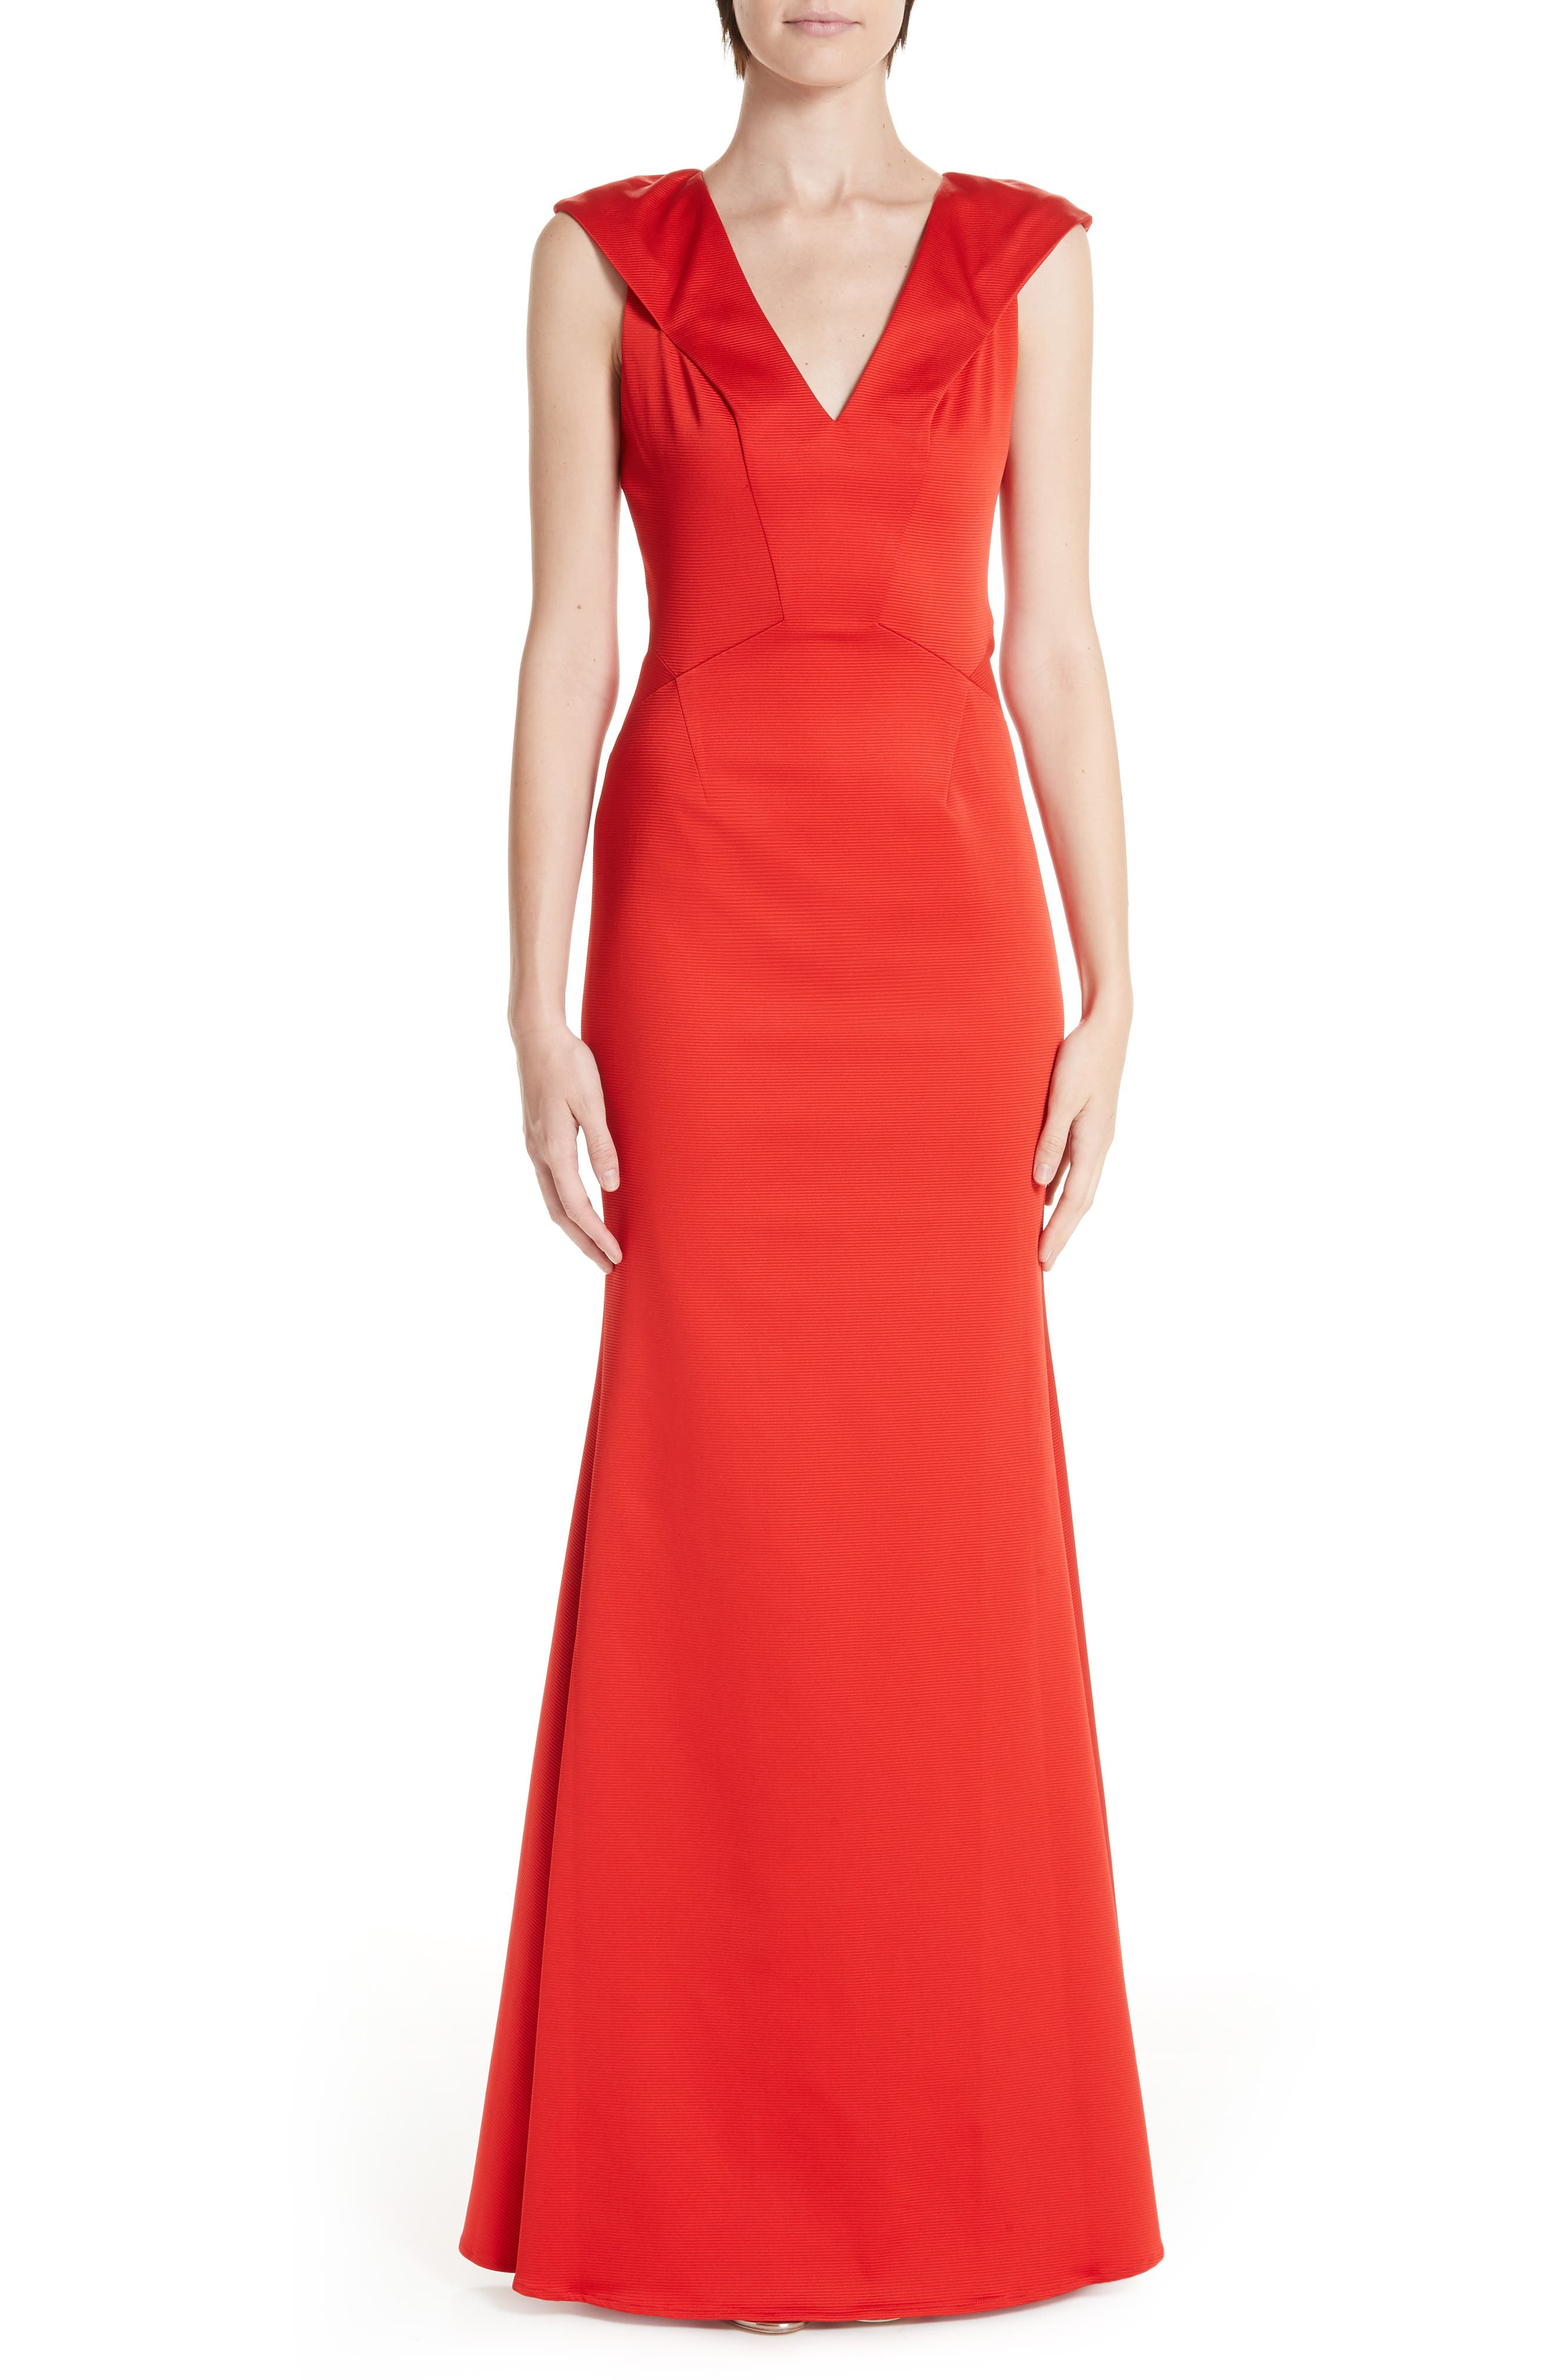 Zac Zac Posen Nina Trumpet Gown, Red